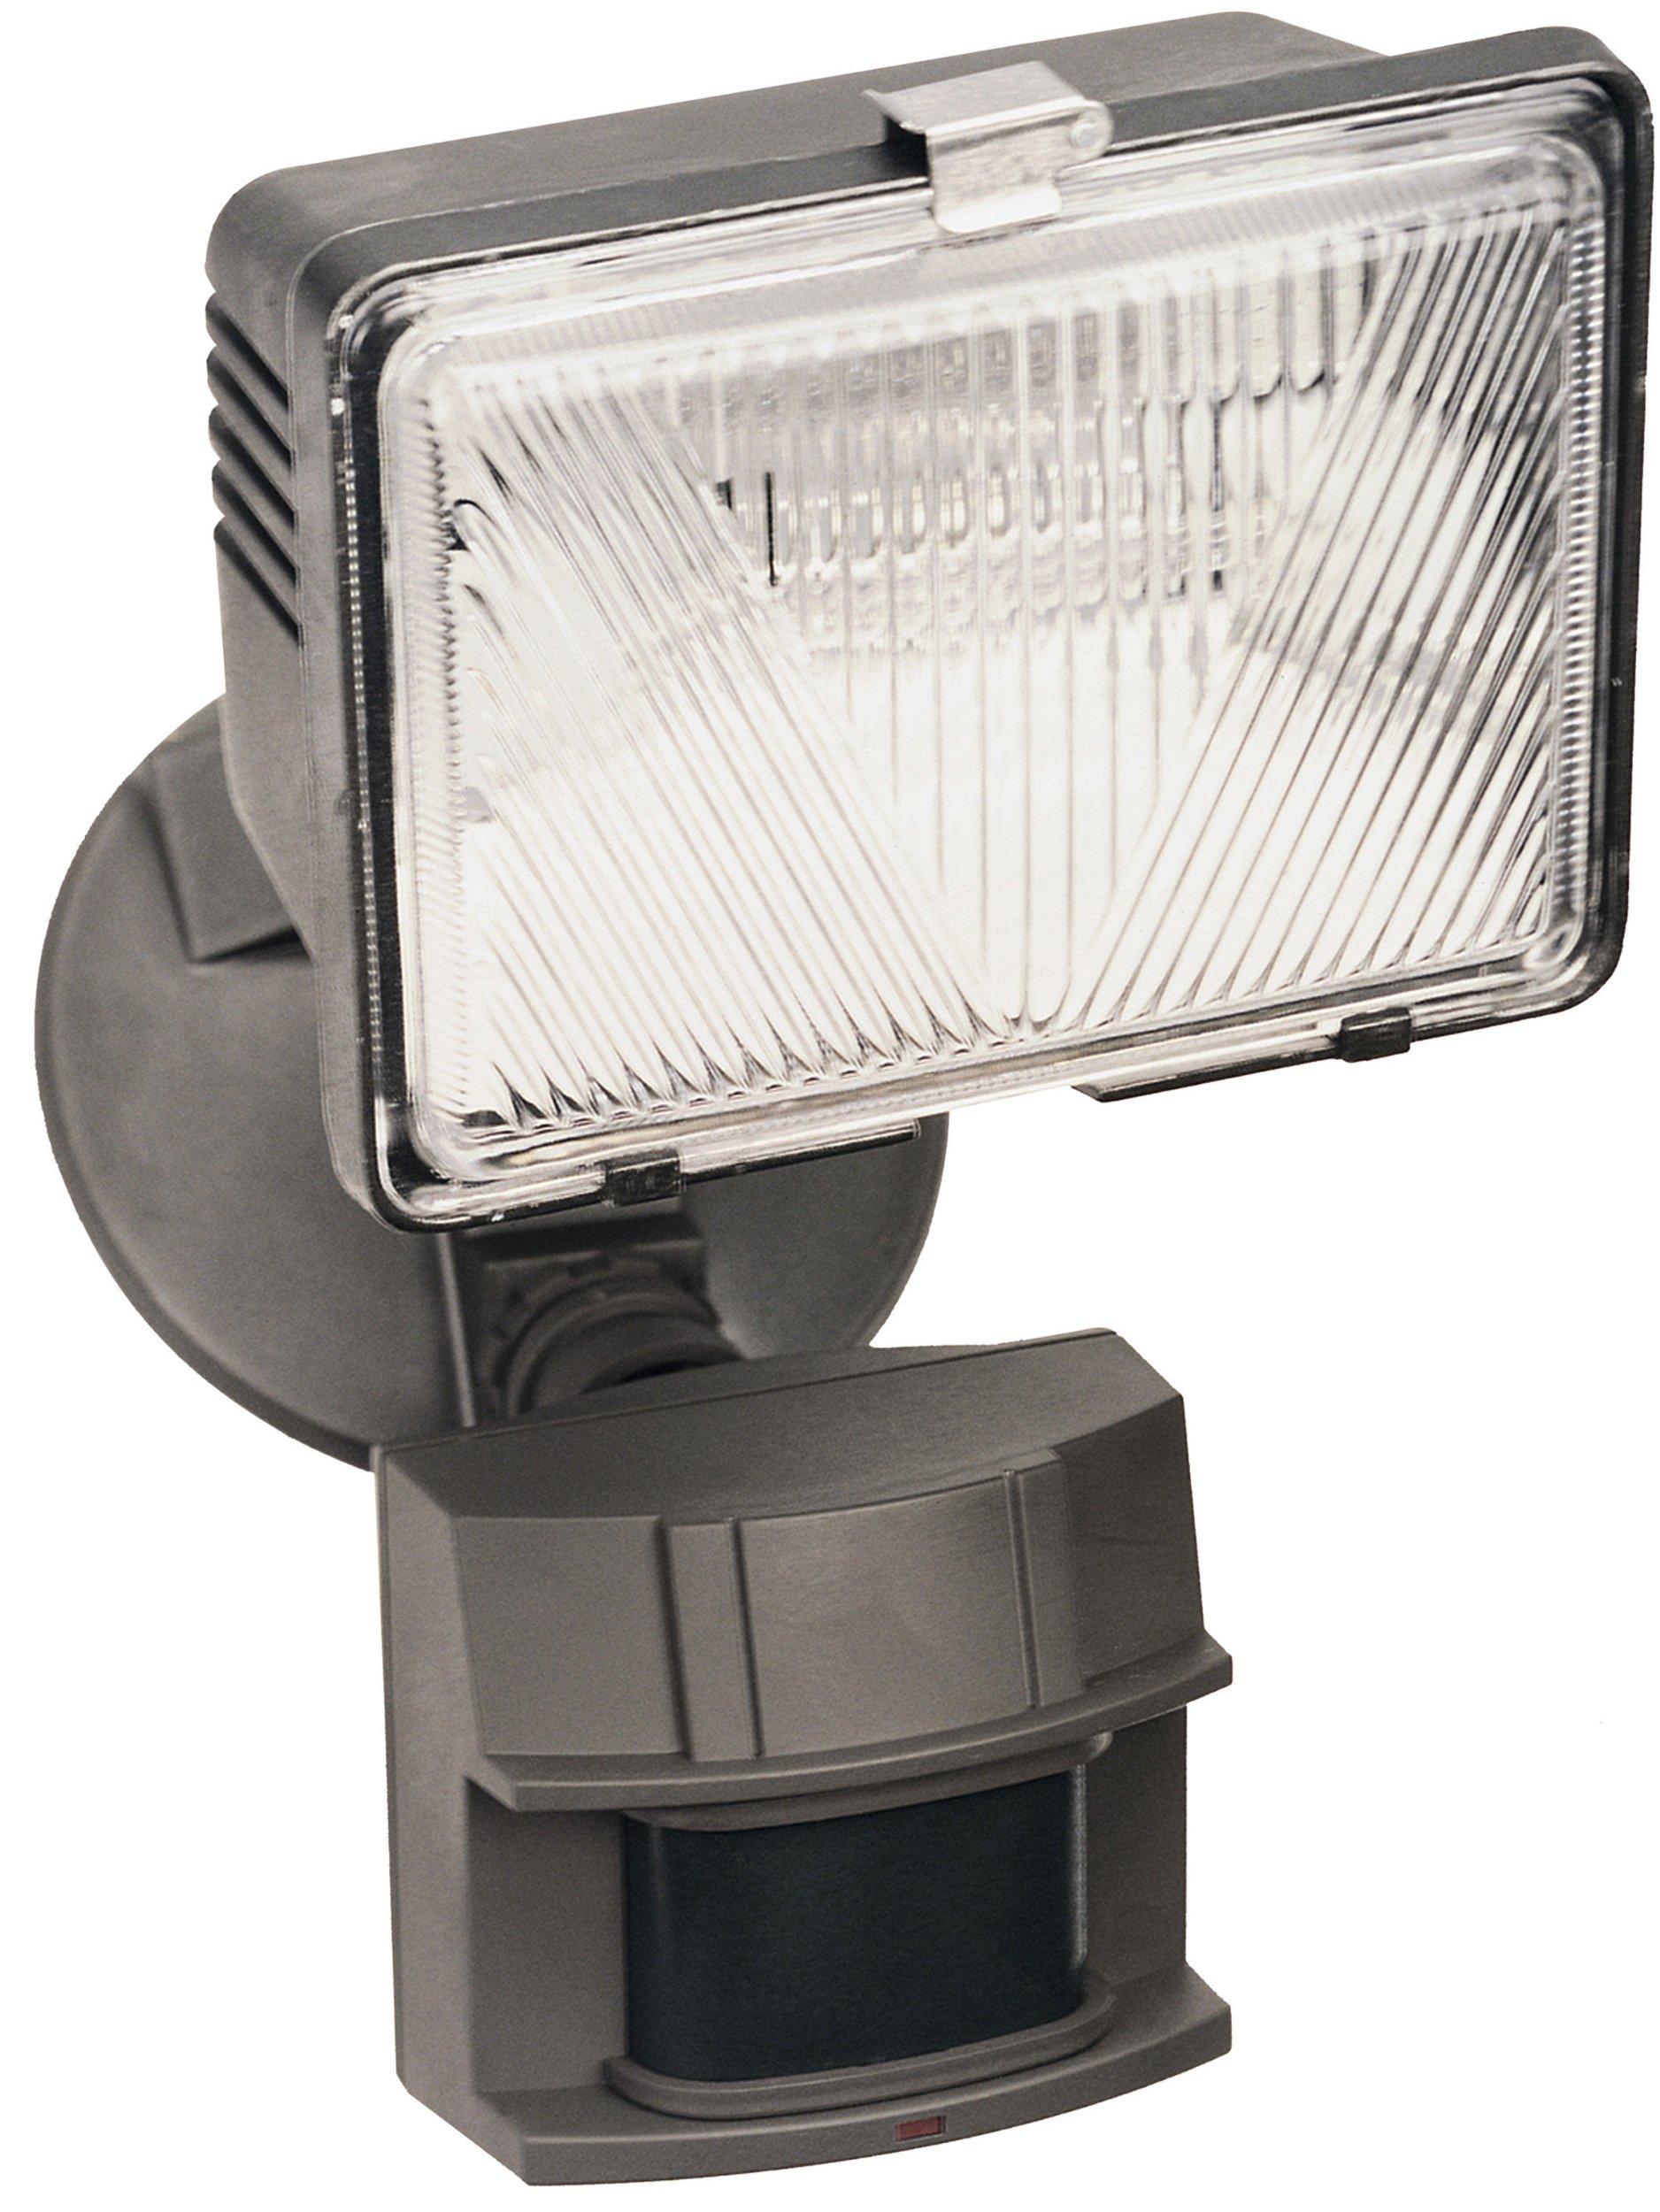 Heath Zenith SL-5525-BZ-C 180 Degree Halogen Motion Sensing Security Light, Bronze